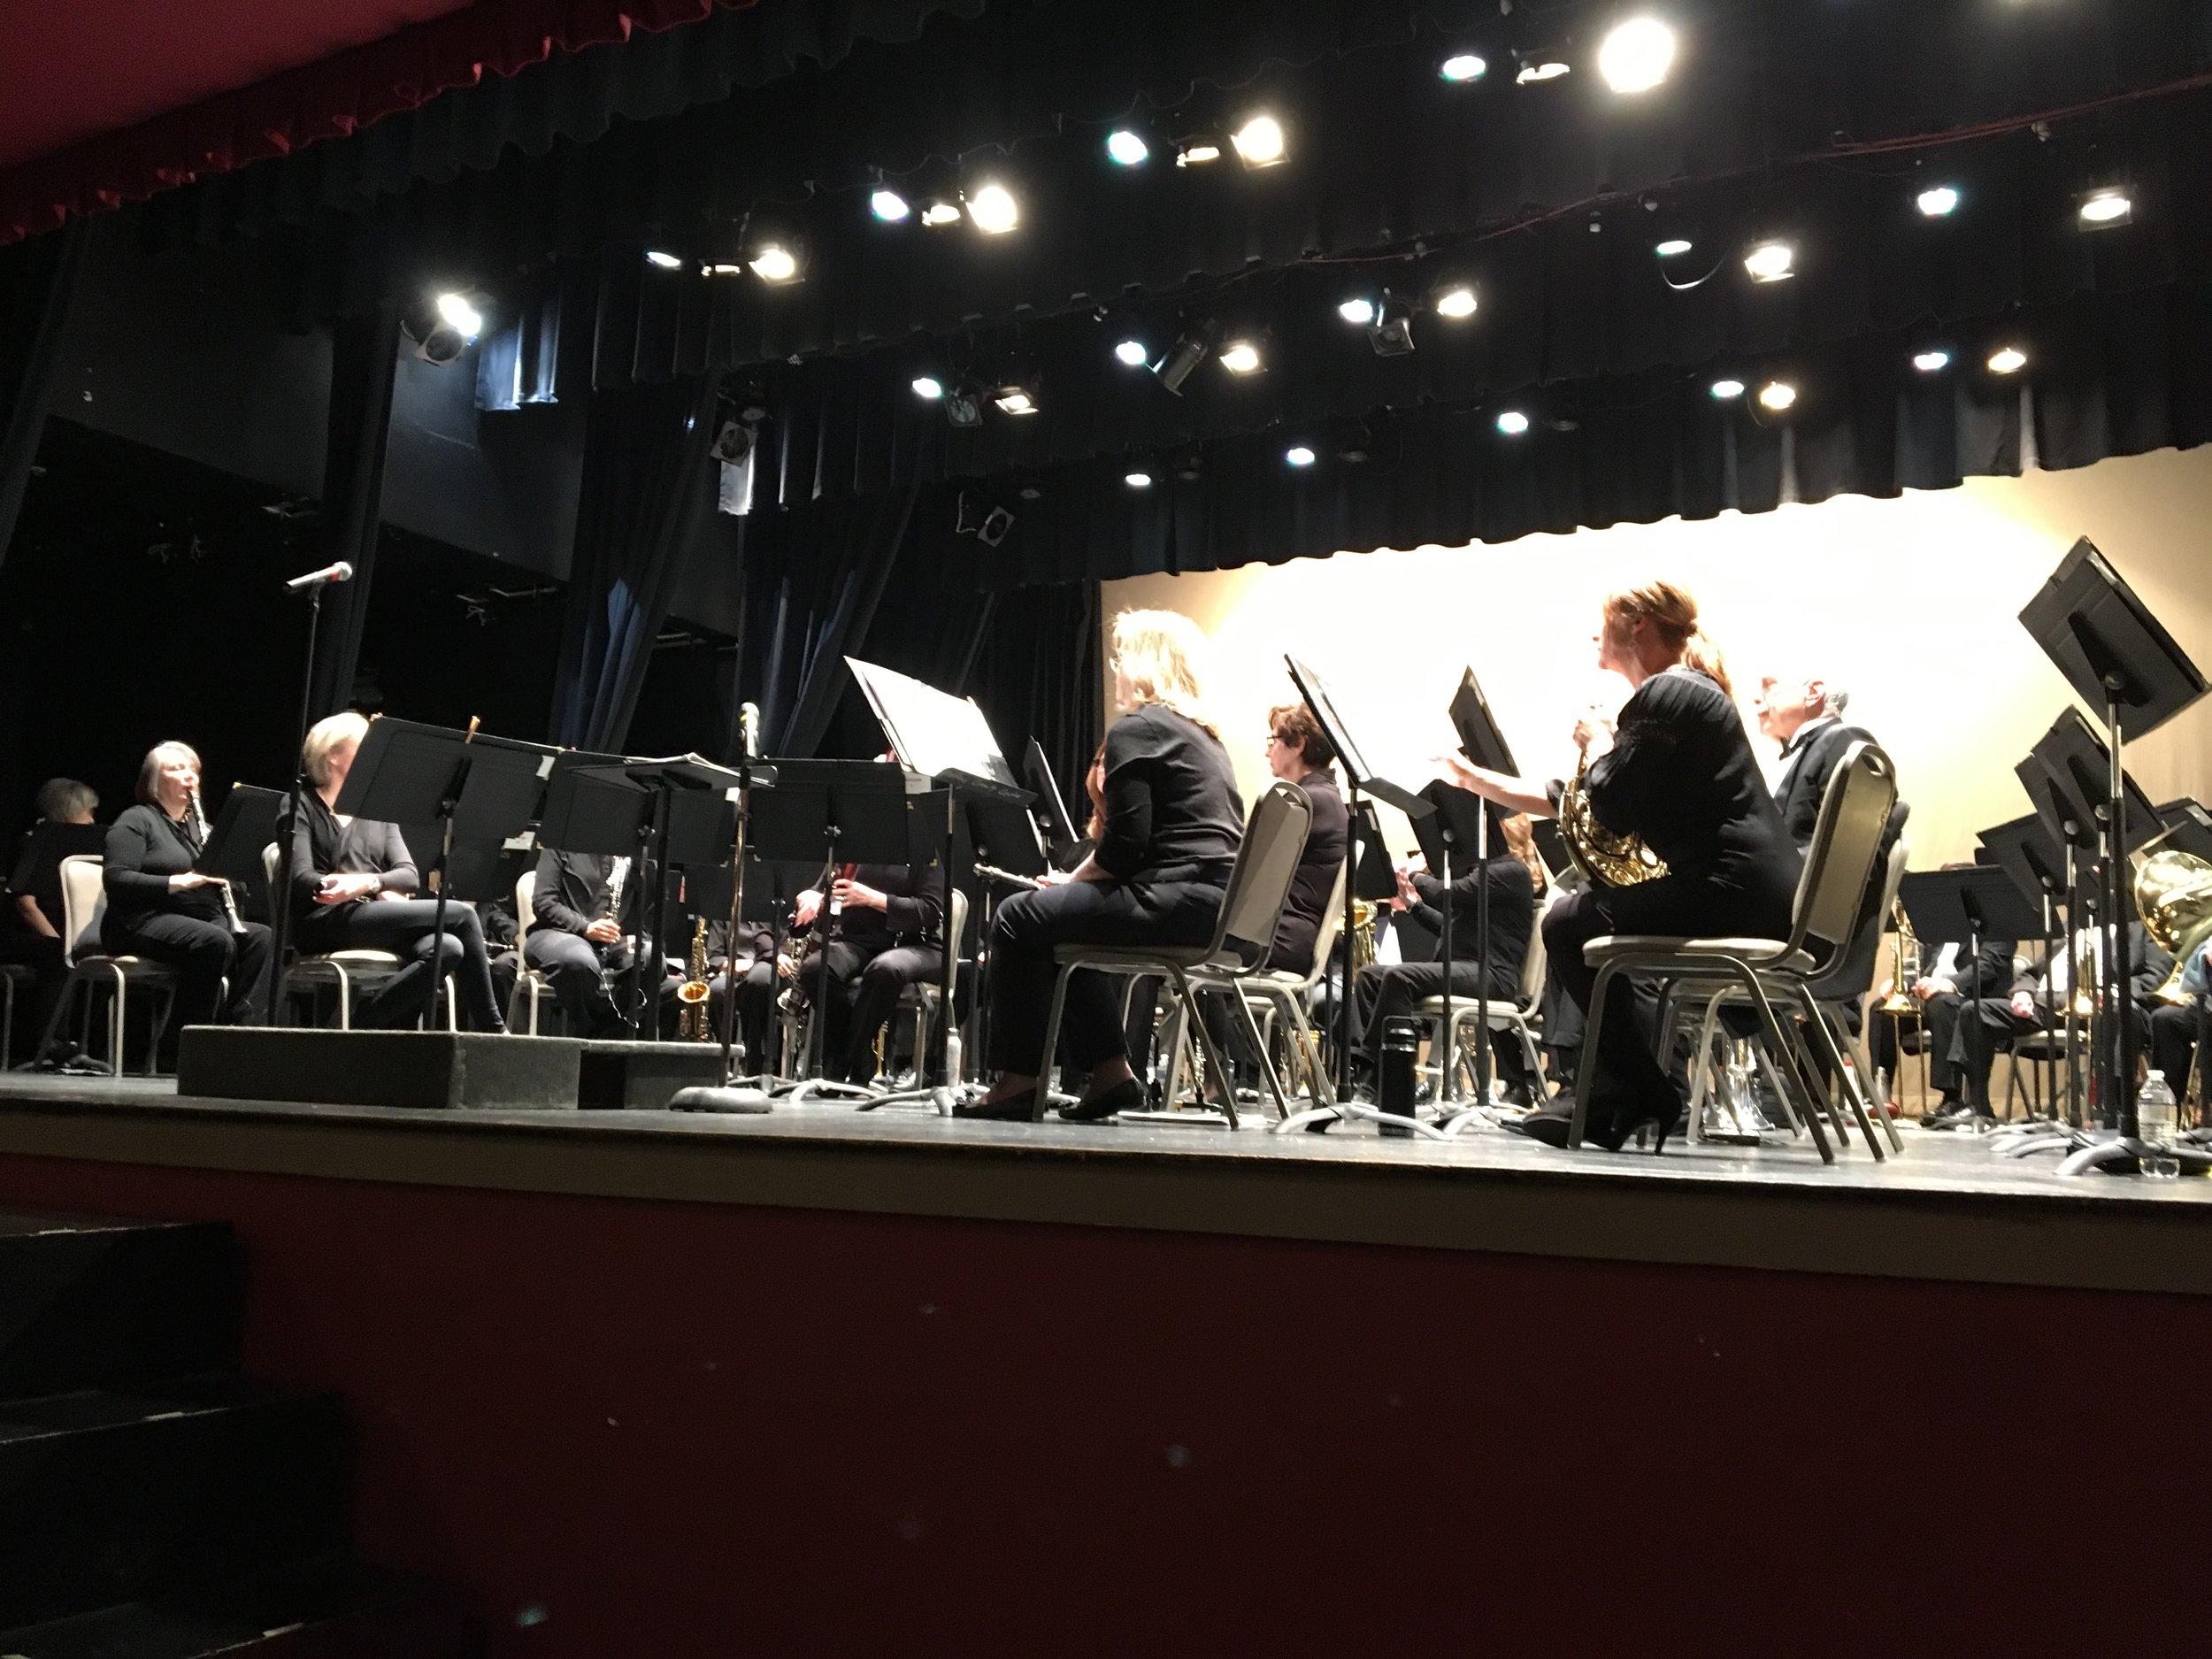 concert band 2.JPG